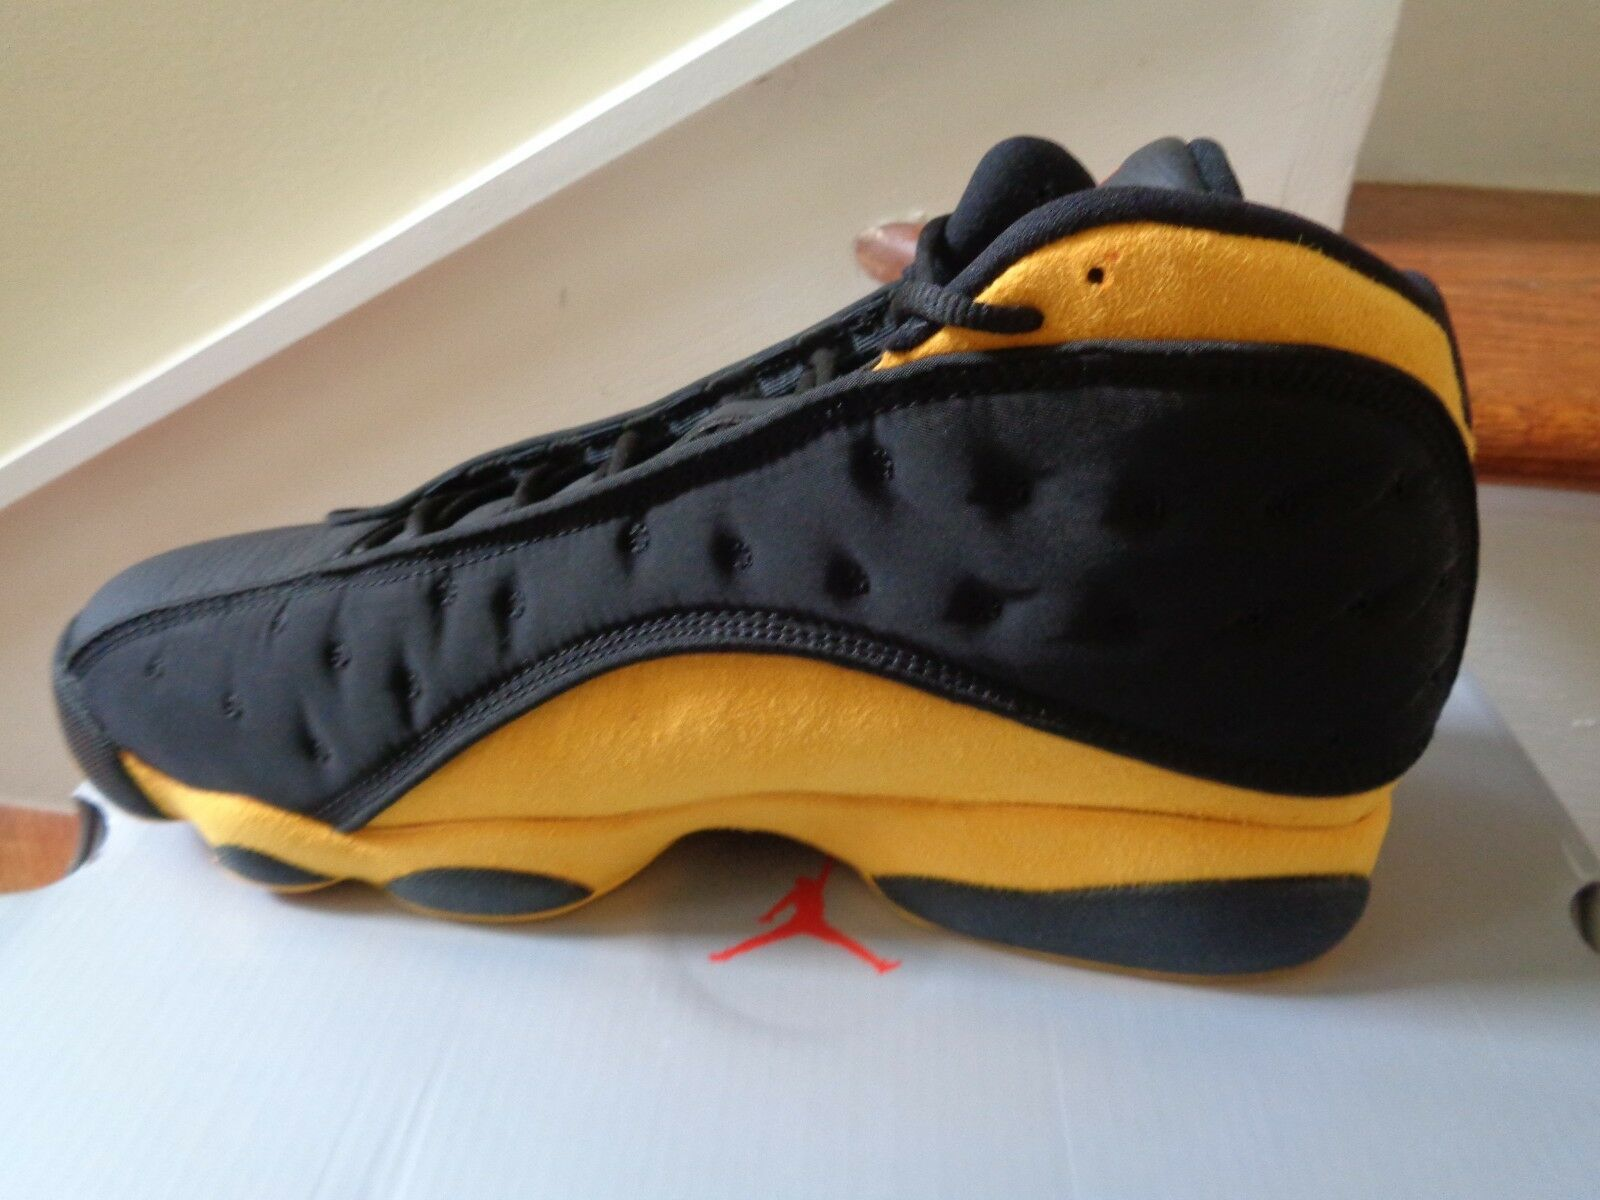 Nike Air Jordan 13 Retro Men's Basketball shoes, 414571 035 Size 13 NWB